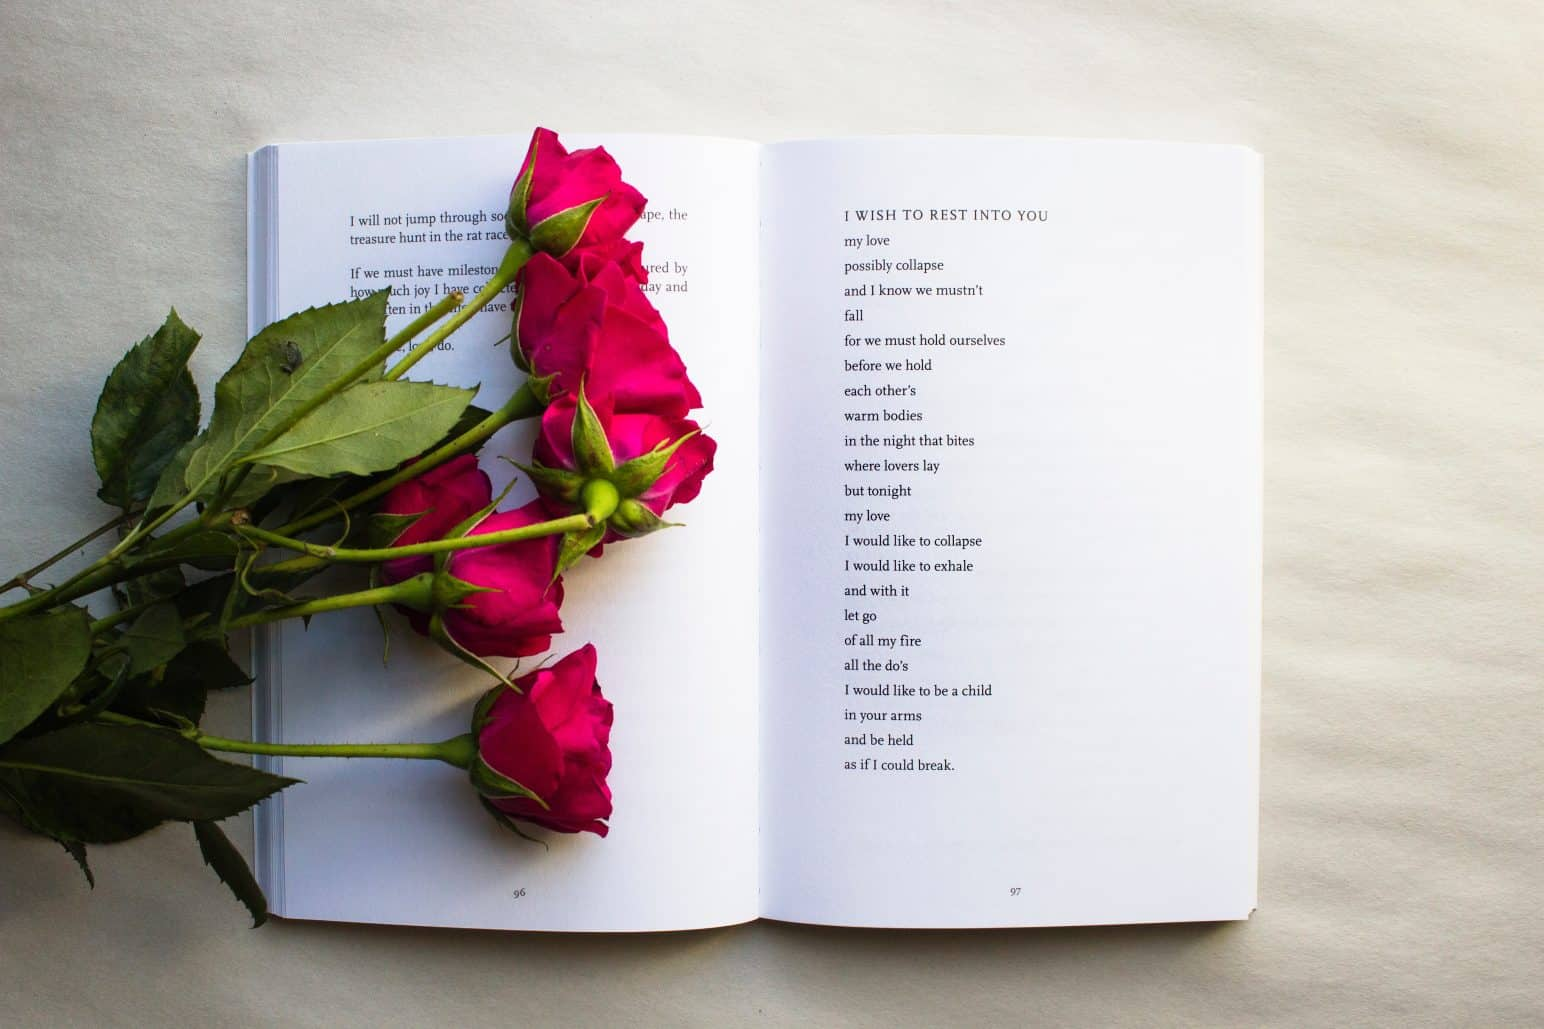 Beautiful Crying Girl Wallpapers 121 Frases Para Seducir A Un Hombre En El 2019 161 Ded 237 Calas